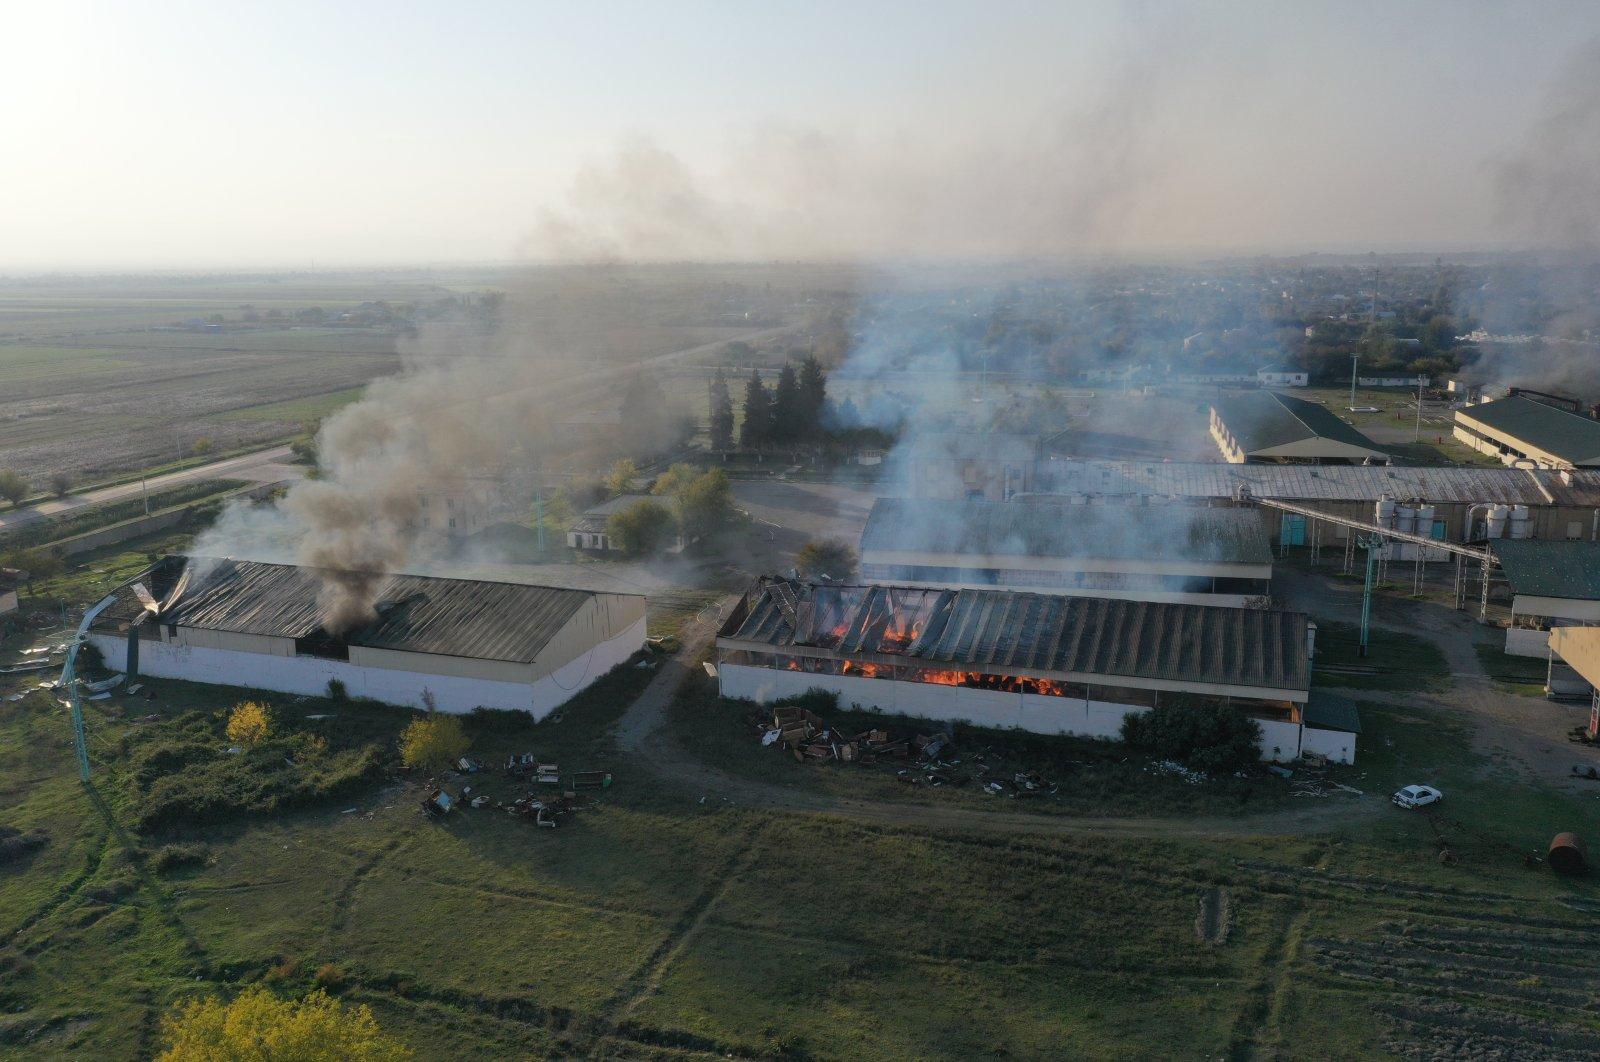 A cotton factory burns following Armenian artillery firedespite a cease-fire agreement between Baku and Yerevan, in a village in the Azerbaijani city of Tartar, Oct. 19, 2020. (AA Photo)